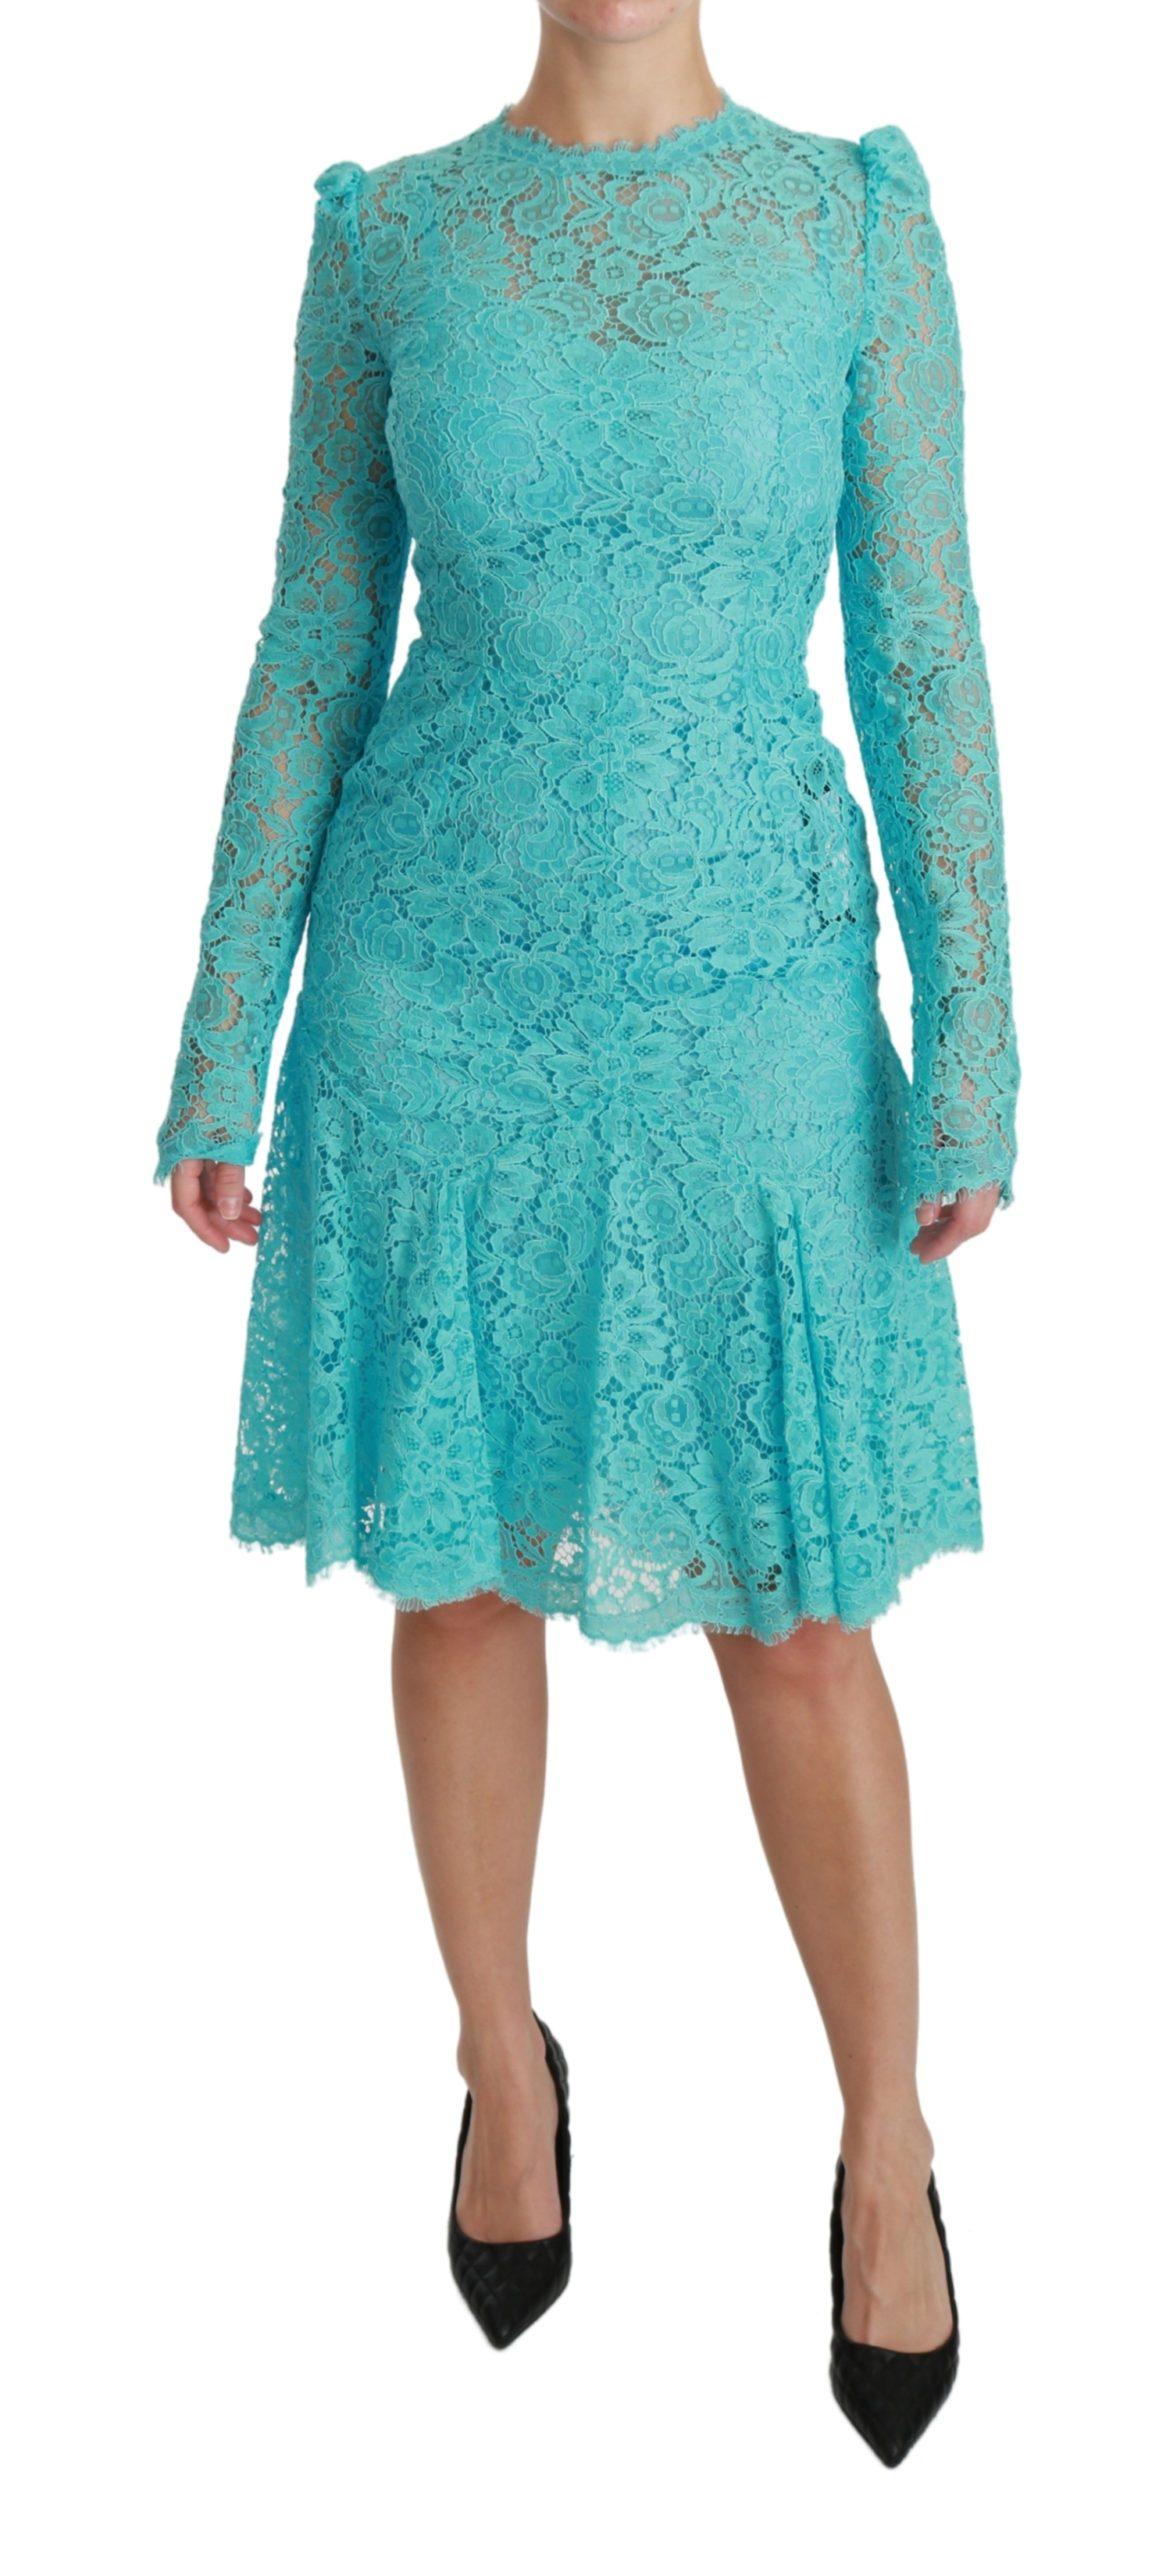 Dolce & Gabbana Women's Lace Knee Sheath Cotton Dress Light Blue DR2518 - IT40|S